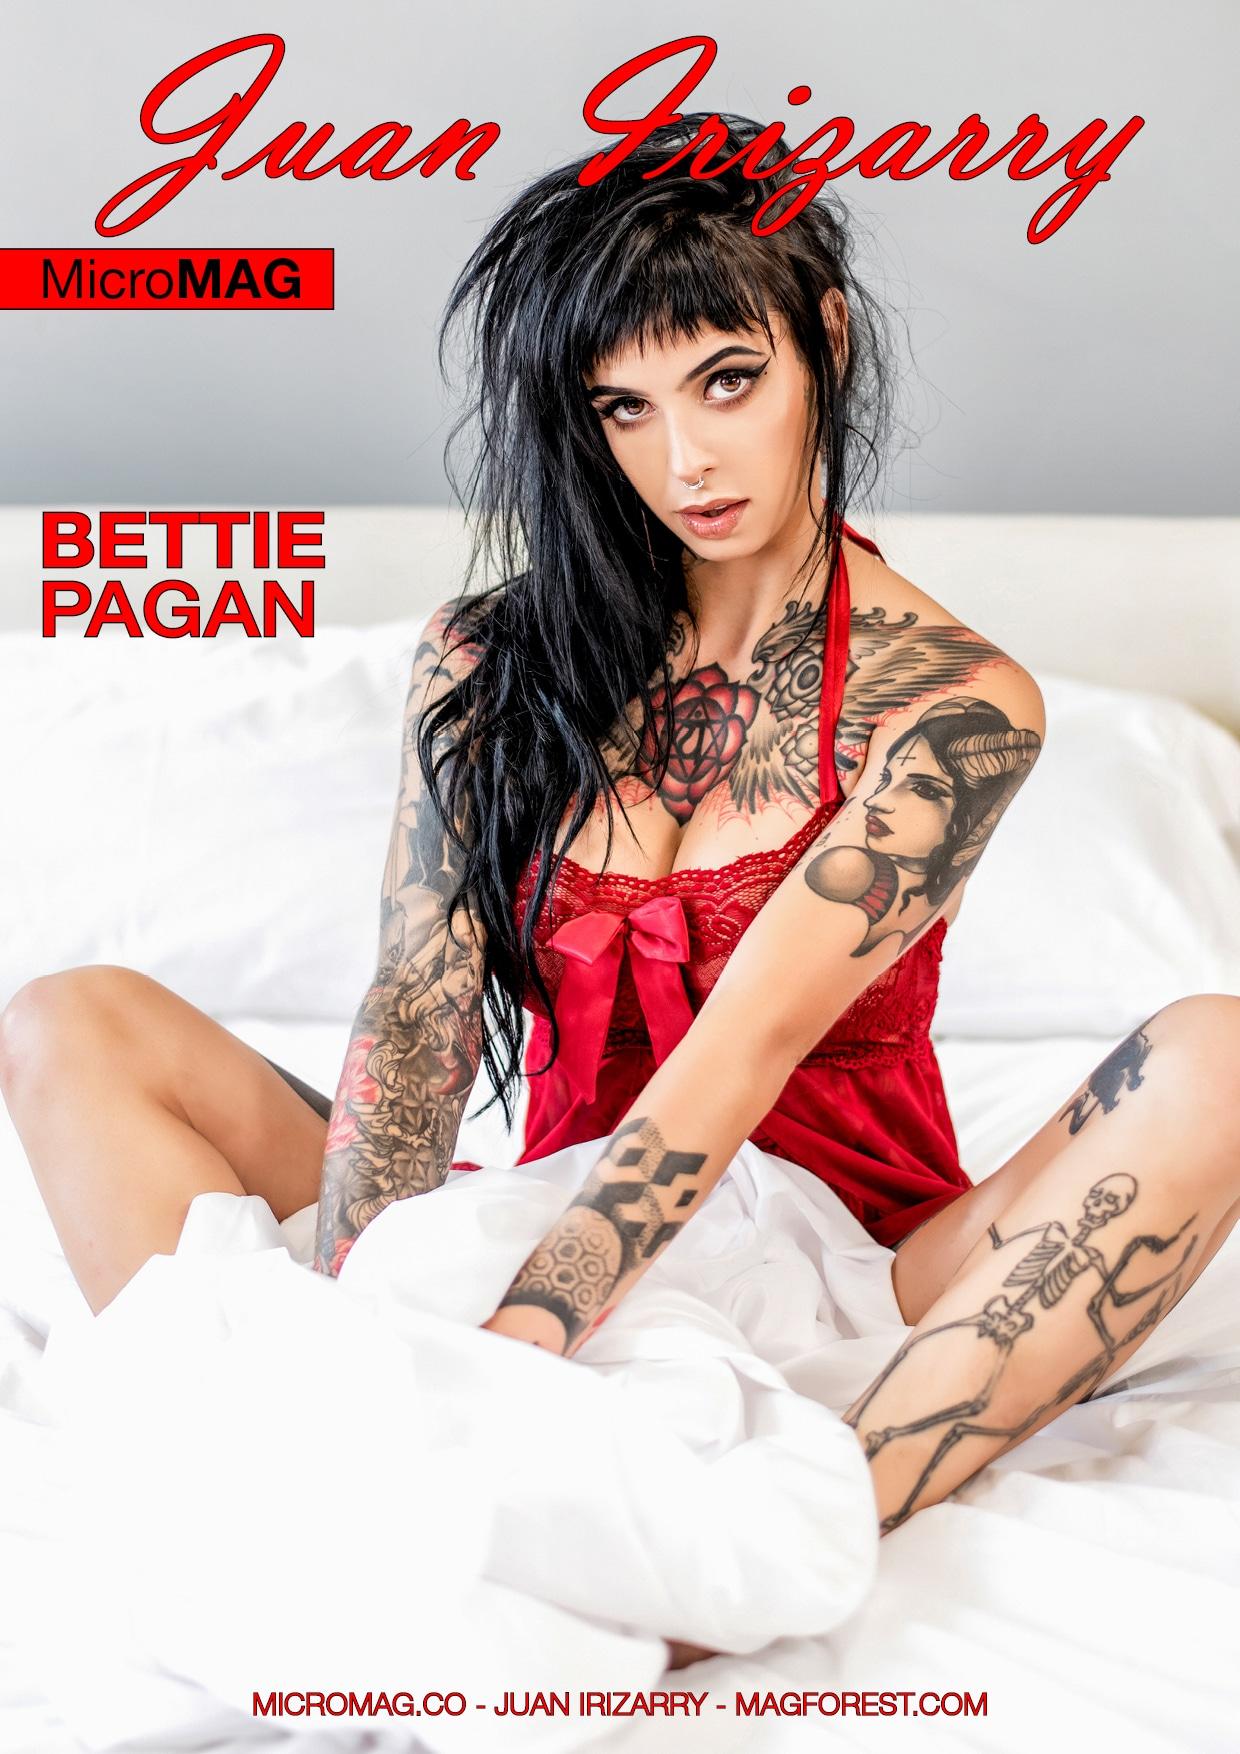 Juan Irizarry MicroMAG - Bettie Pagan - Issue 2